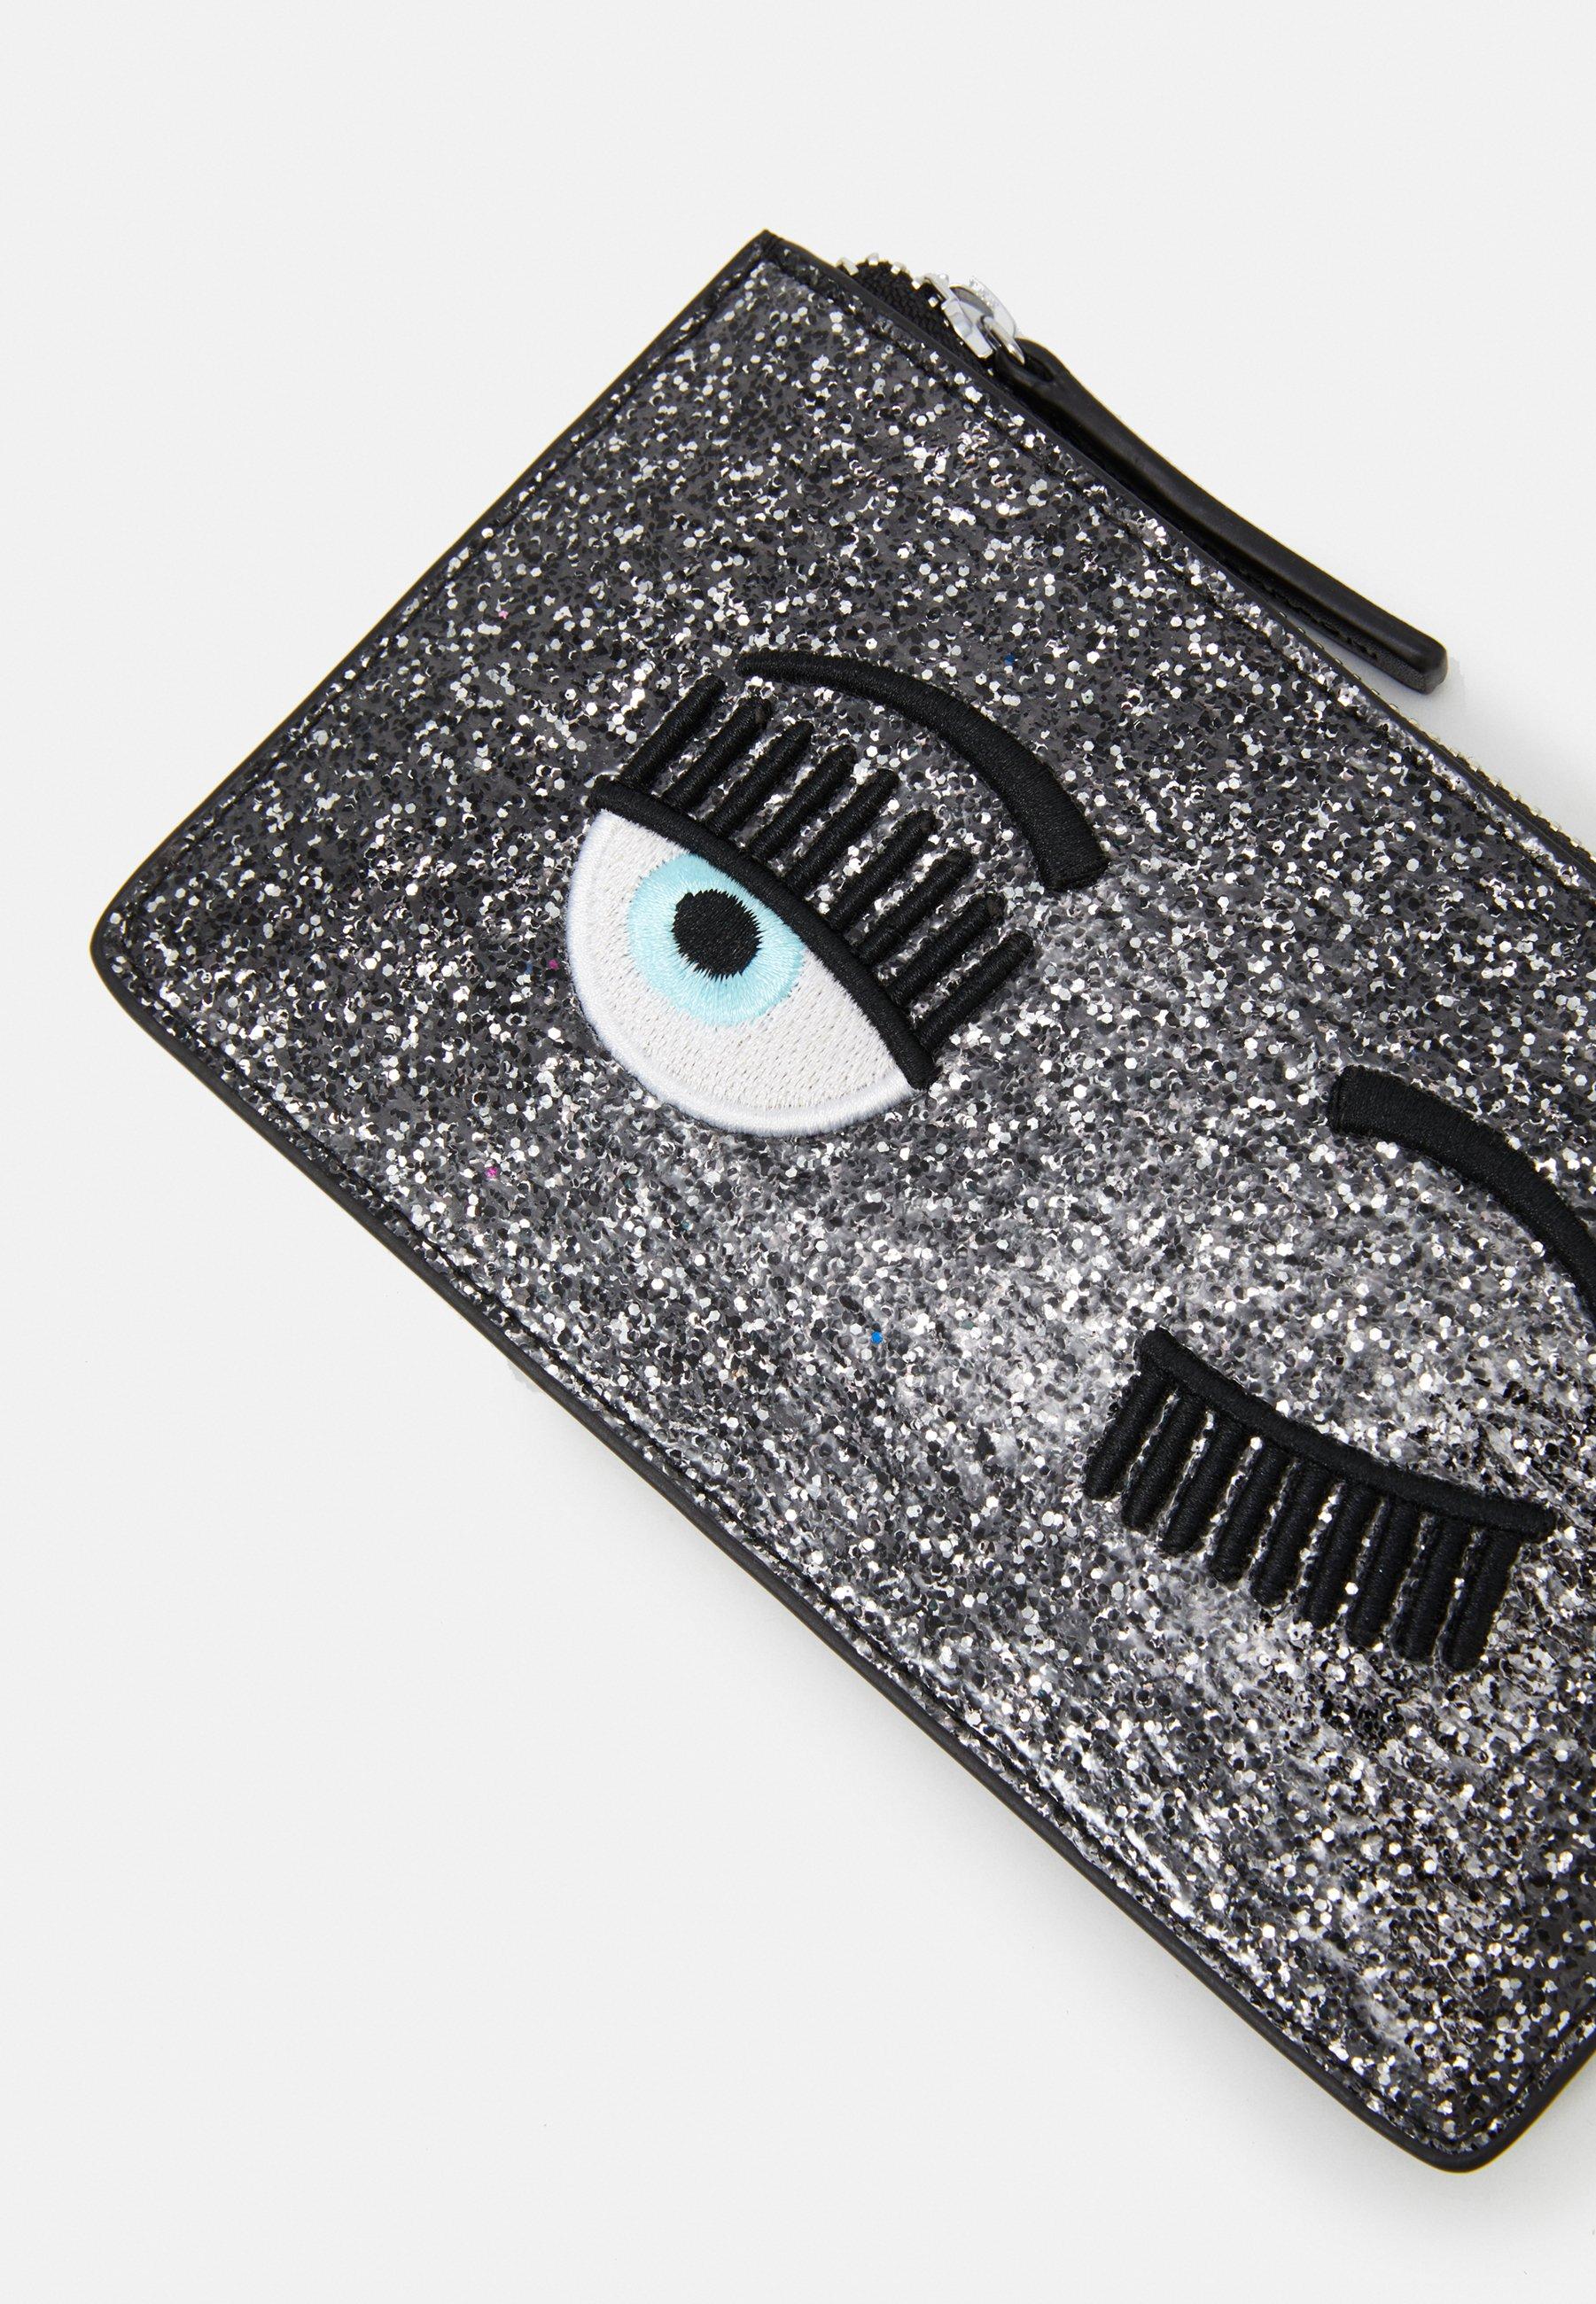 Cheapest Clearance Accessories CHIARA FERRAGNI FLIRTING GLITTER POCHETTE Clutch black N1DbfhARp Vy0HEO9TD